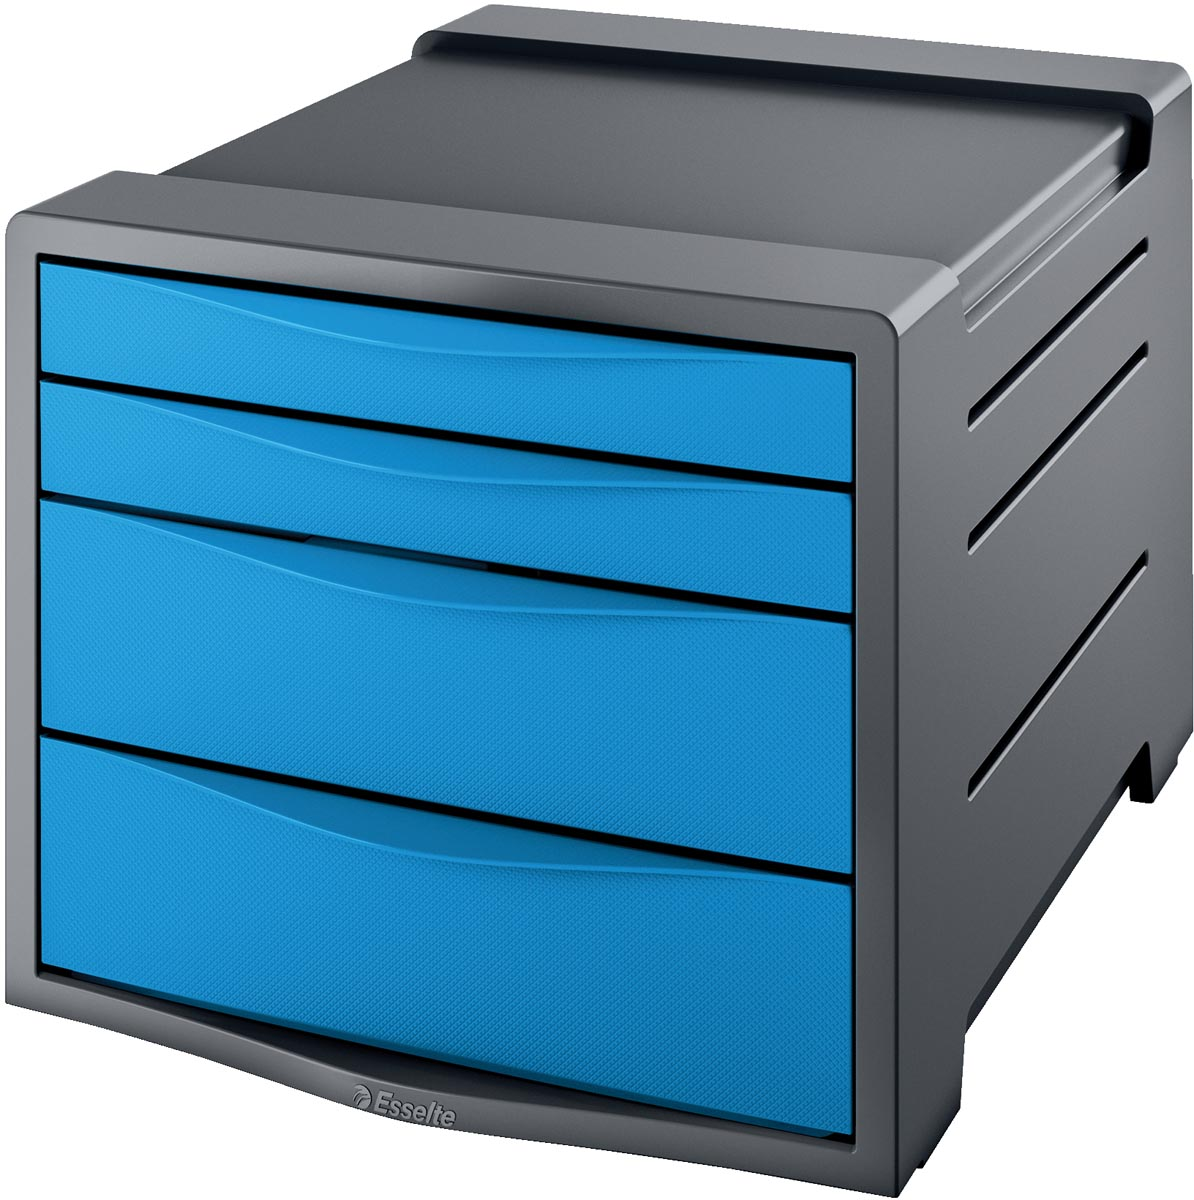 Esselte ladenblok Vivida 4 laden, blauw